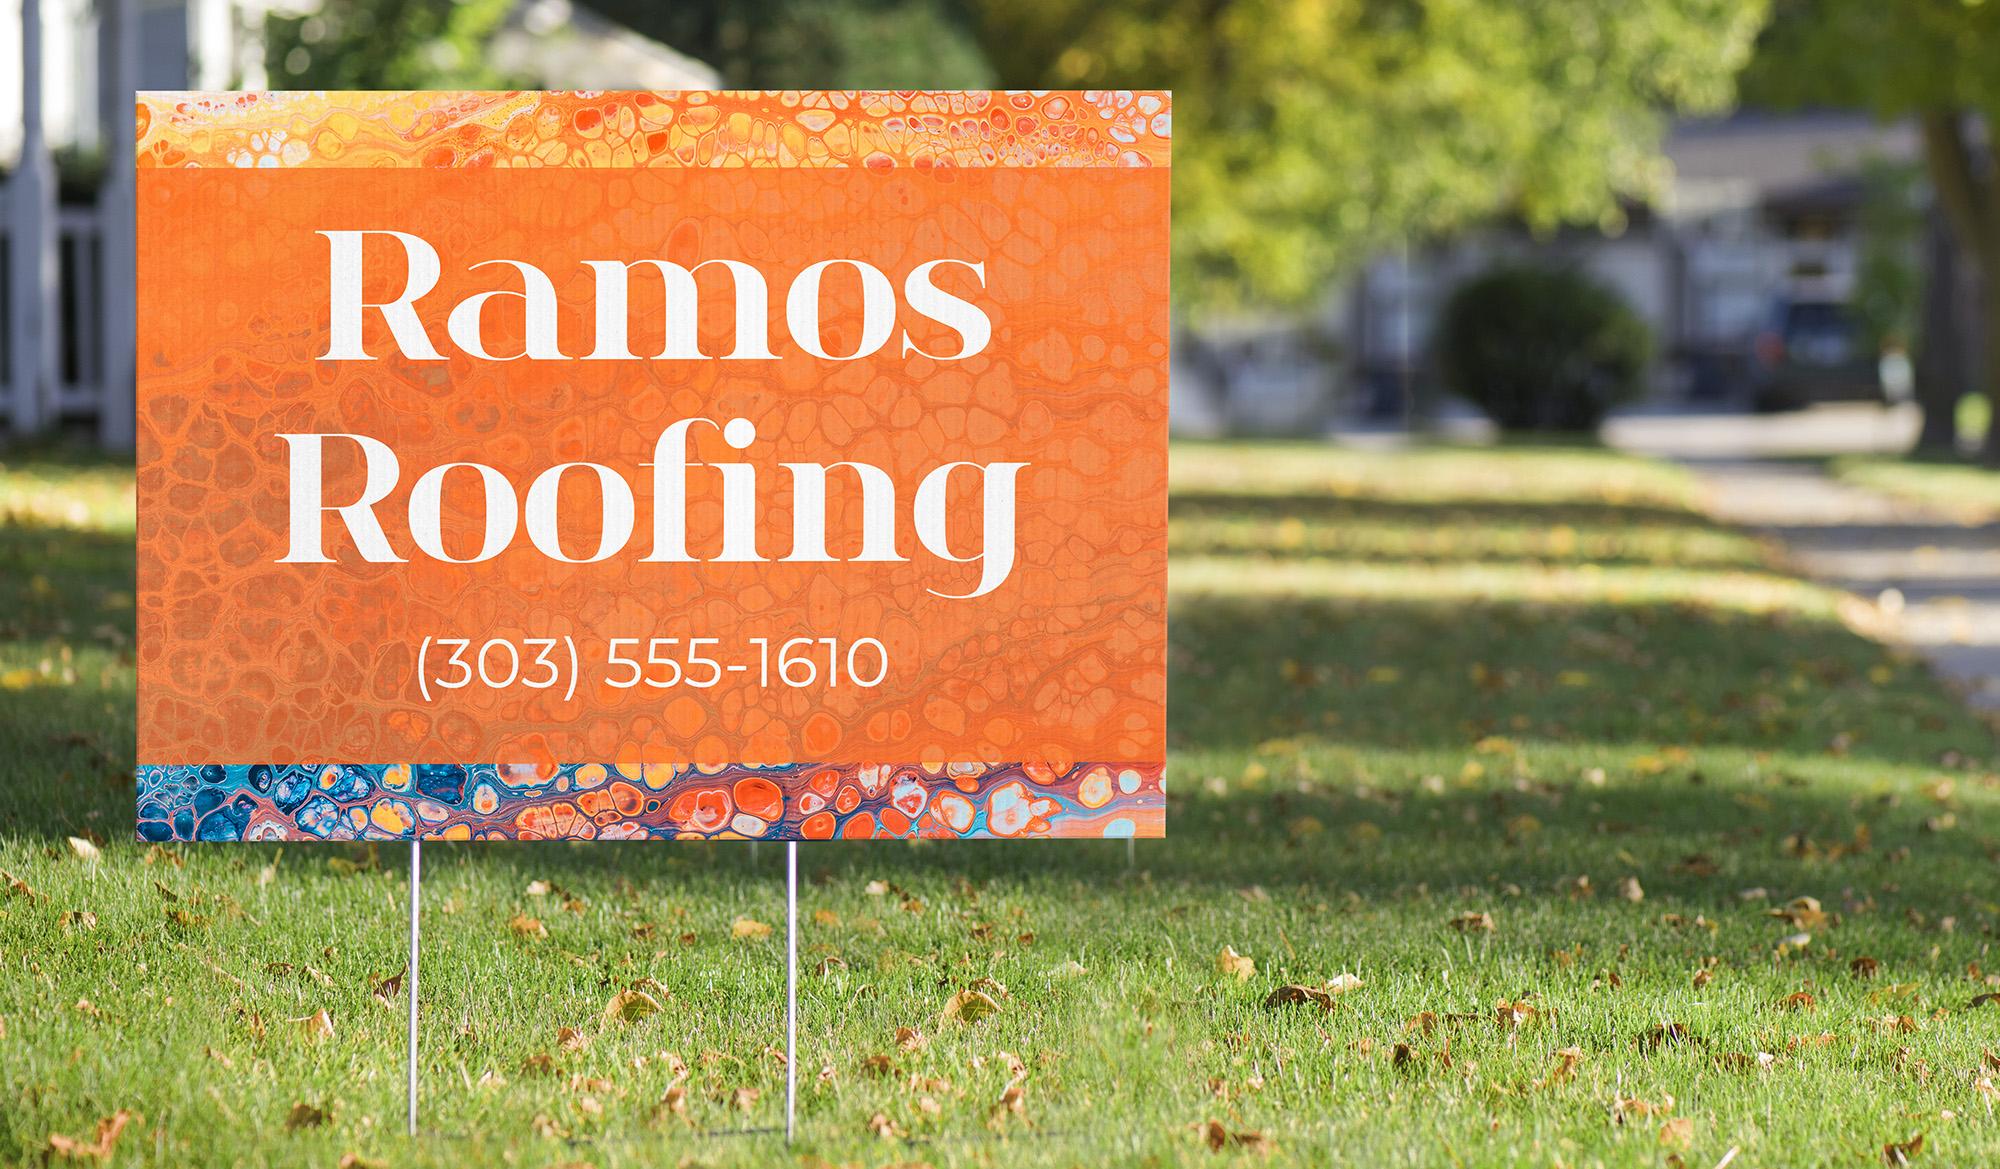 No Smoking Victorian Gothic Premium Acrylic Sign CGSignLab 2470459/_5absw/_27x18/_None 27x18